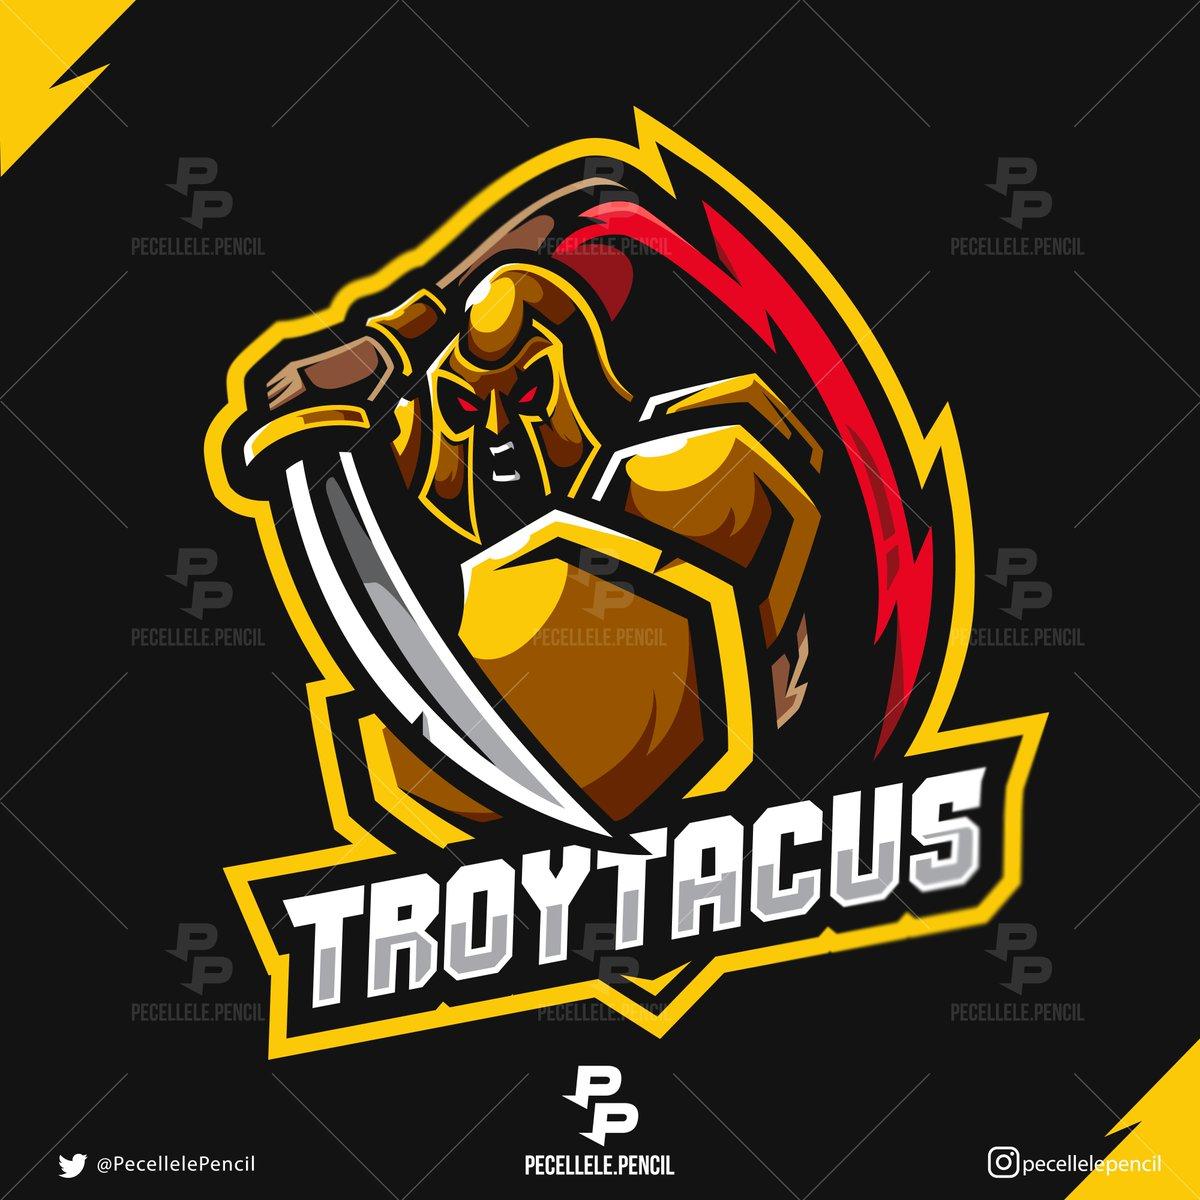 #logo done for @Troytacus. custom order is open now. @SGH_RTs @LaZy_RTs @GamerRetweetNow @GamersRetweetz @BulletinGamers @Quickest_Rts @DNRRTs @RogueRts @FameRTR @Quickest_Rts  #logodesign #gaminglogo #esportslogo #logoesports #squadlogo #mascotlogo #Spartans #knightlogo #twitchpic.twitter.com/hvGtNOahLv